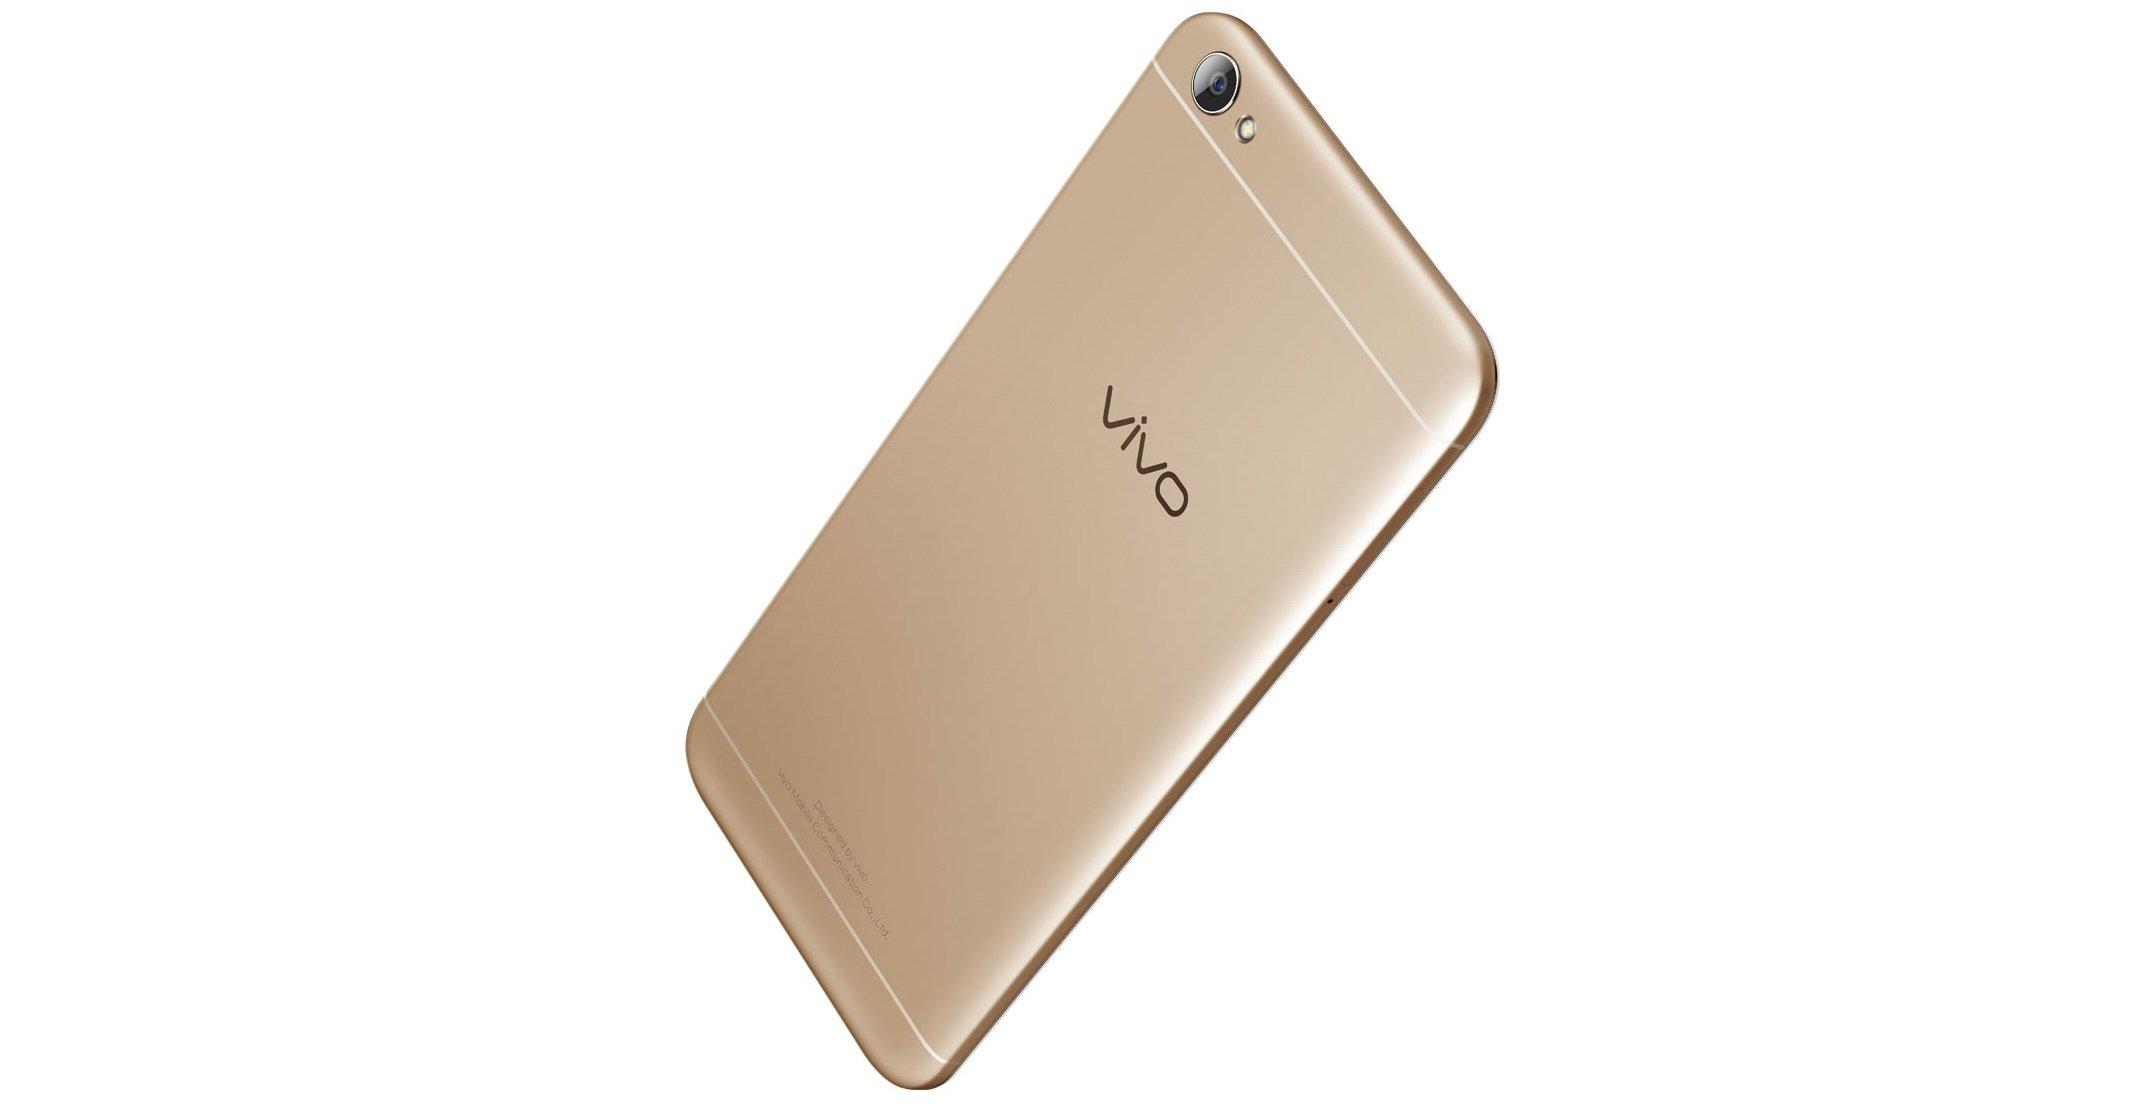 Vivo V5 Plus And Lite Official Here Is The Technical Sheet V5lite 4g I Live